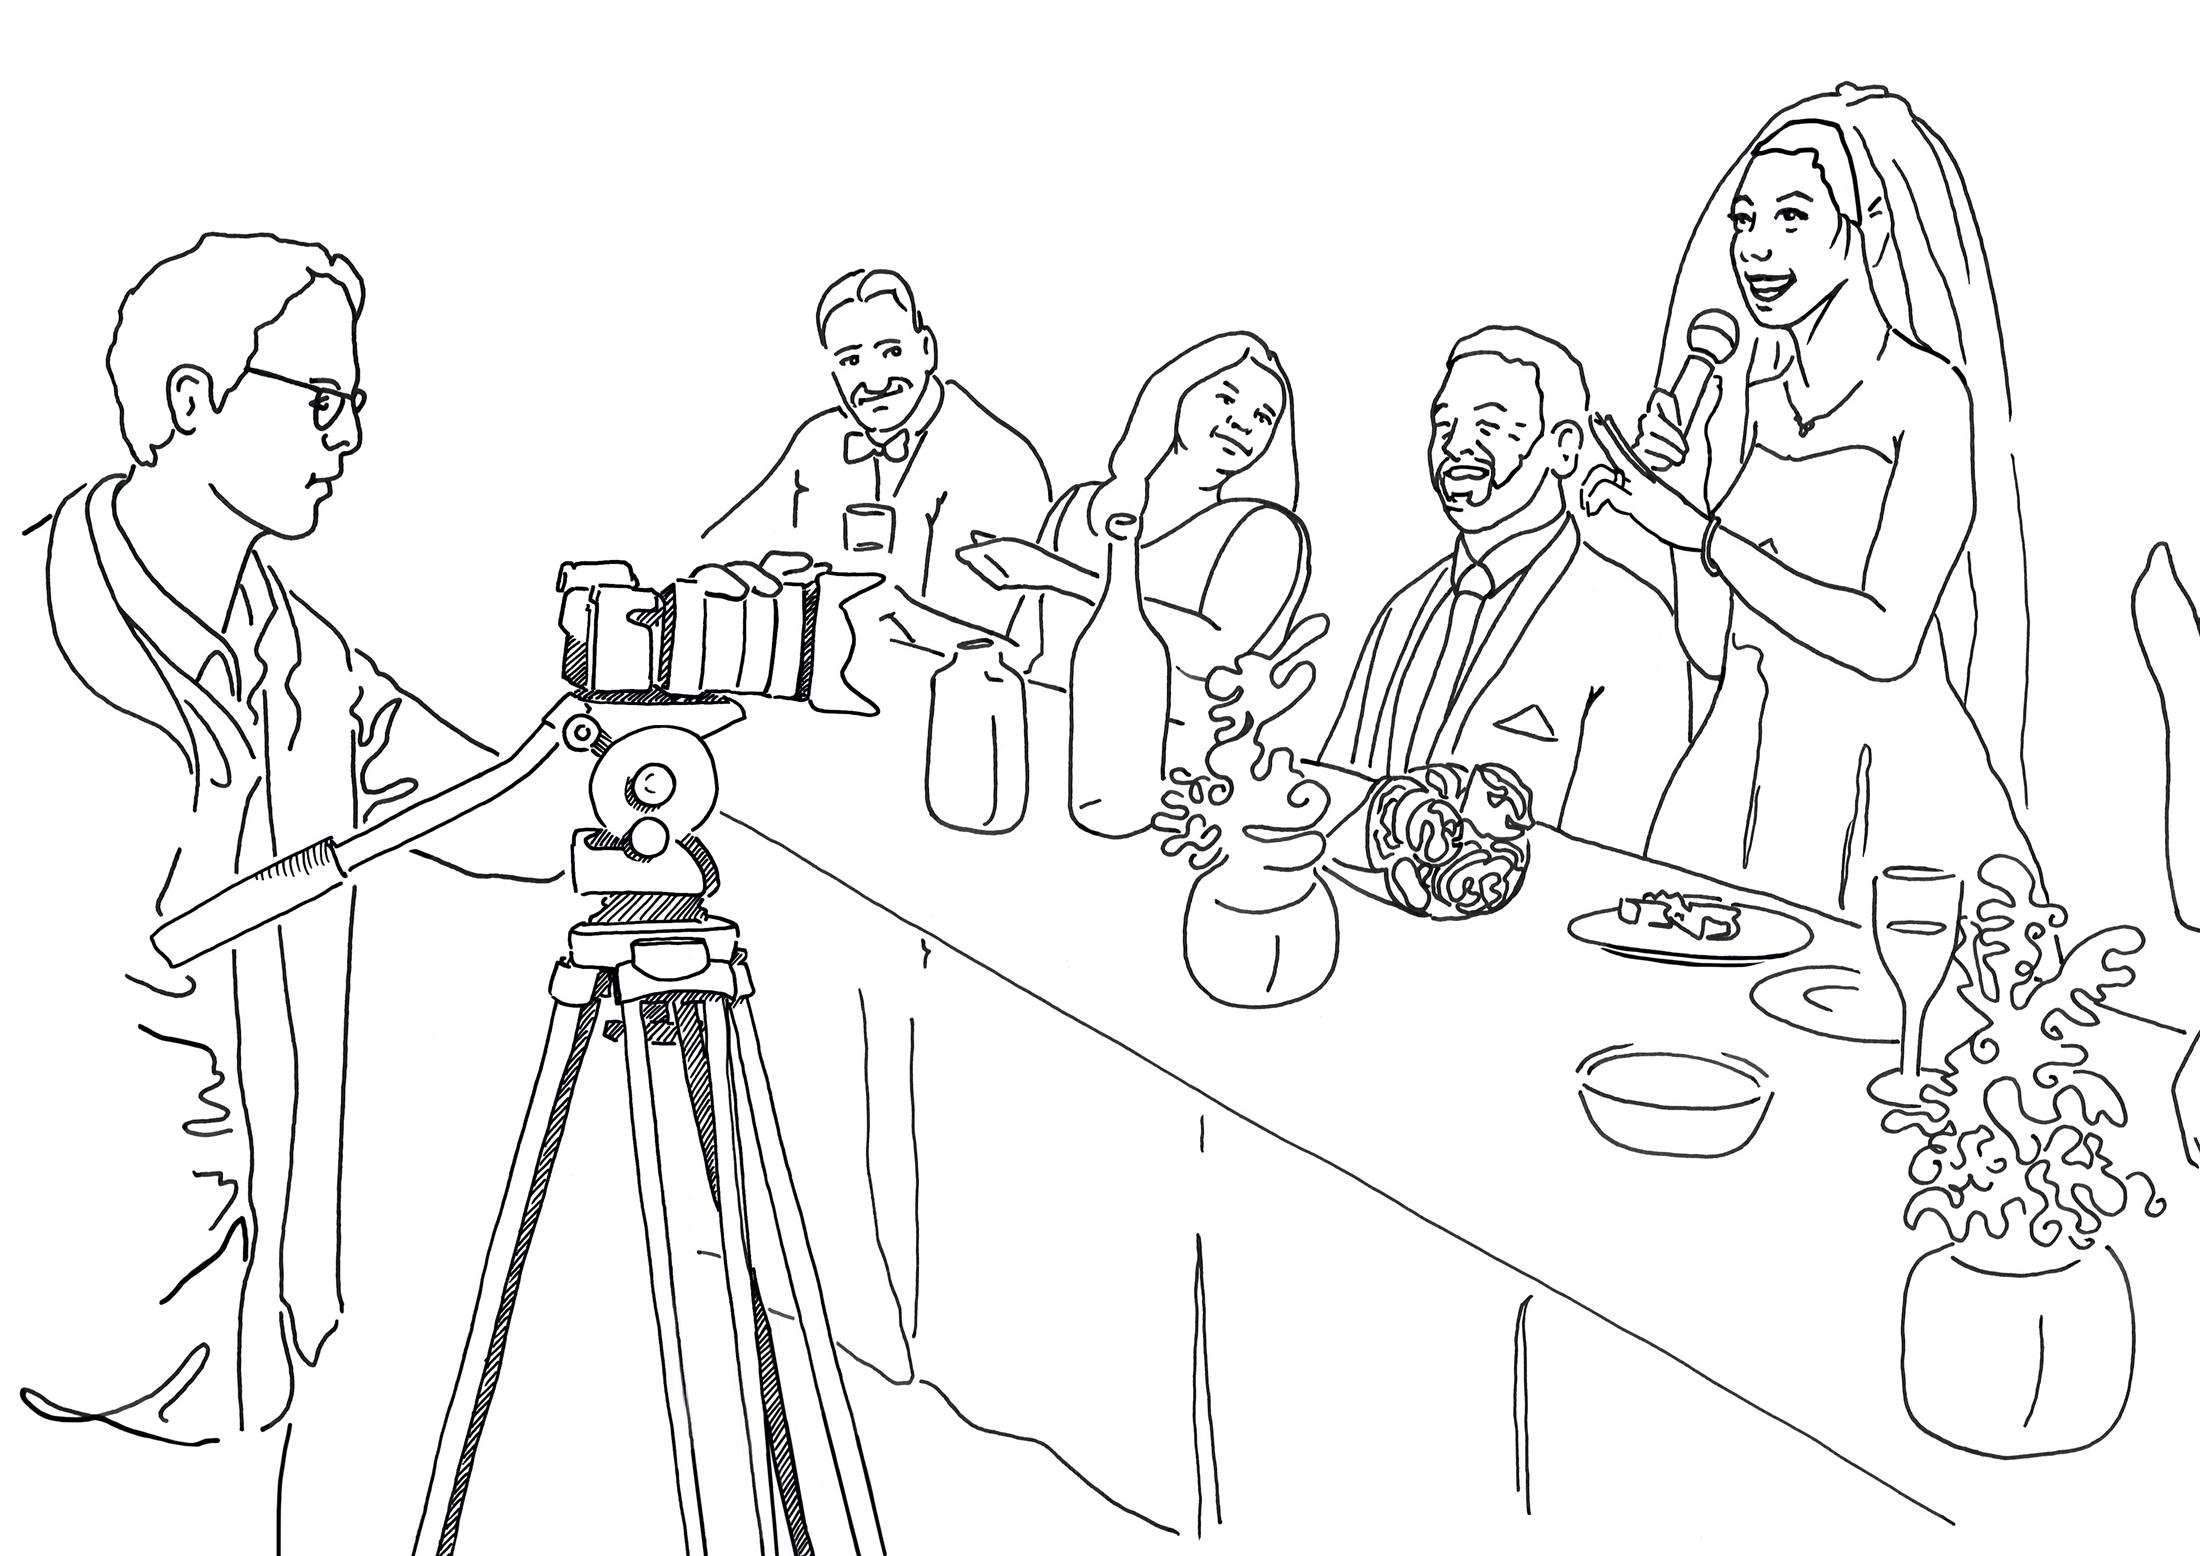 Illustration of wedding setting, camera with no mic setup